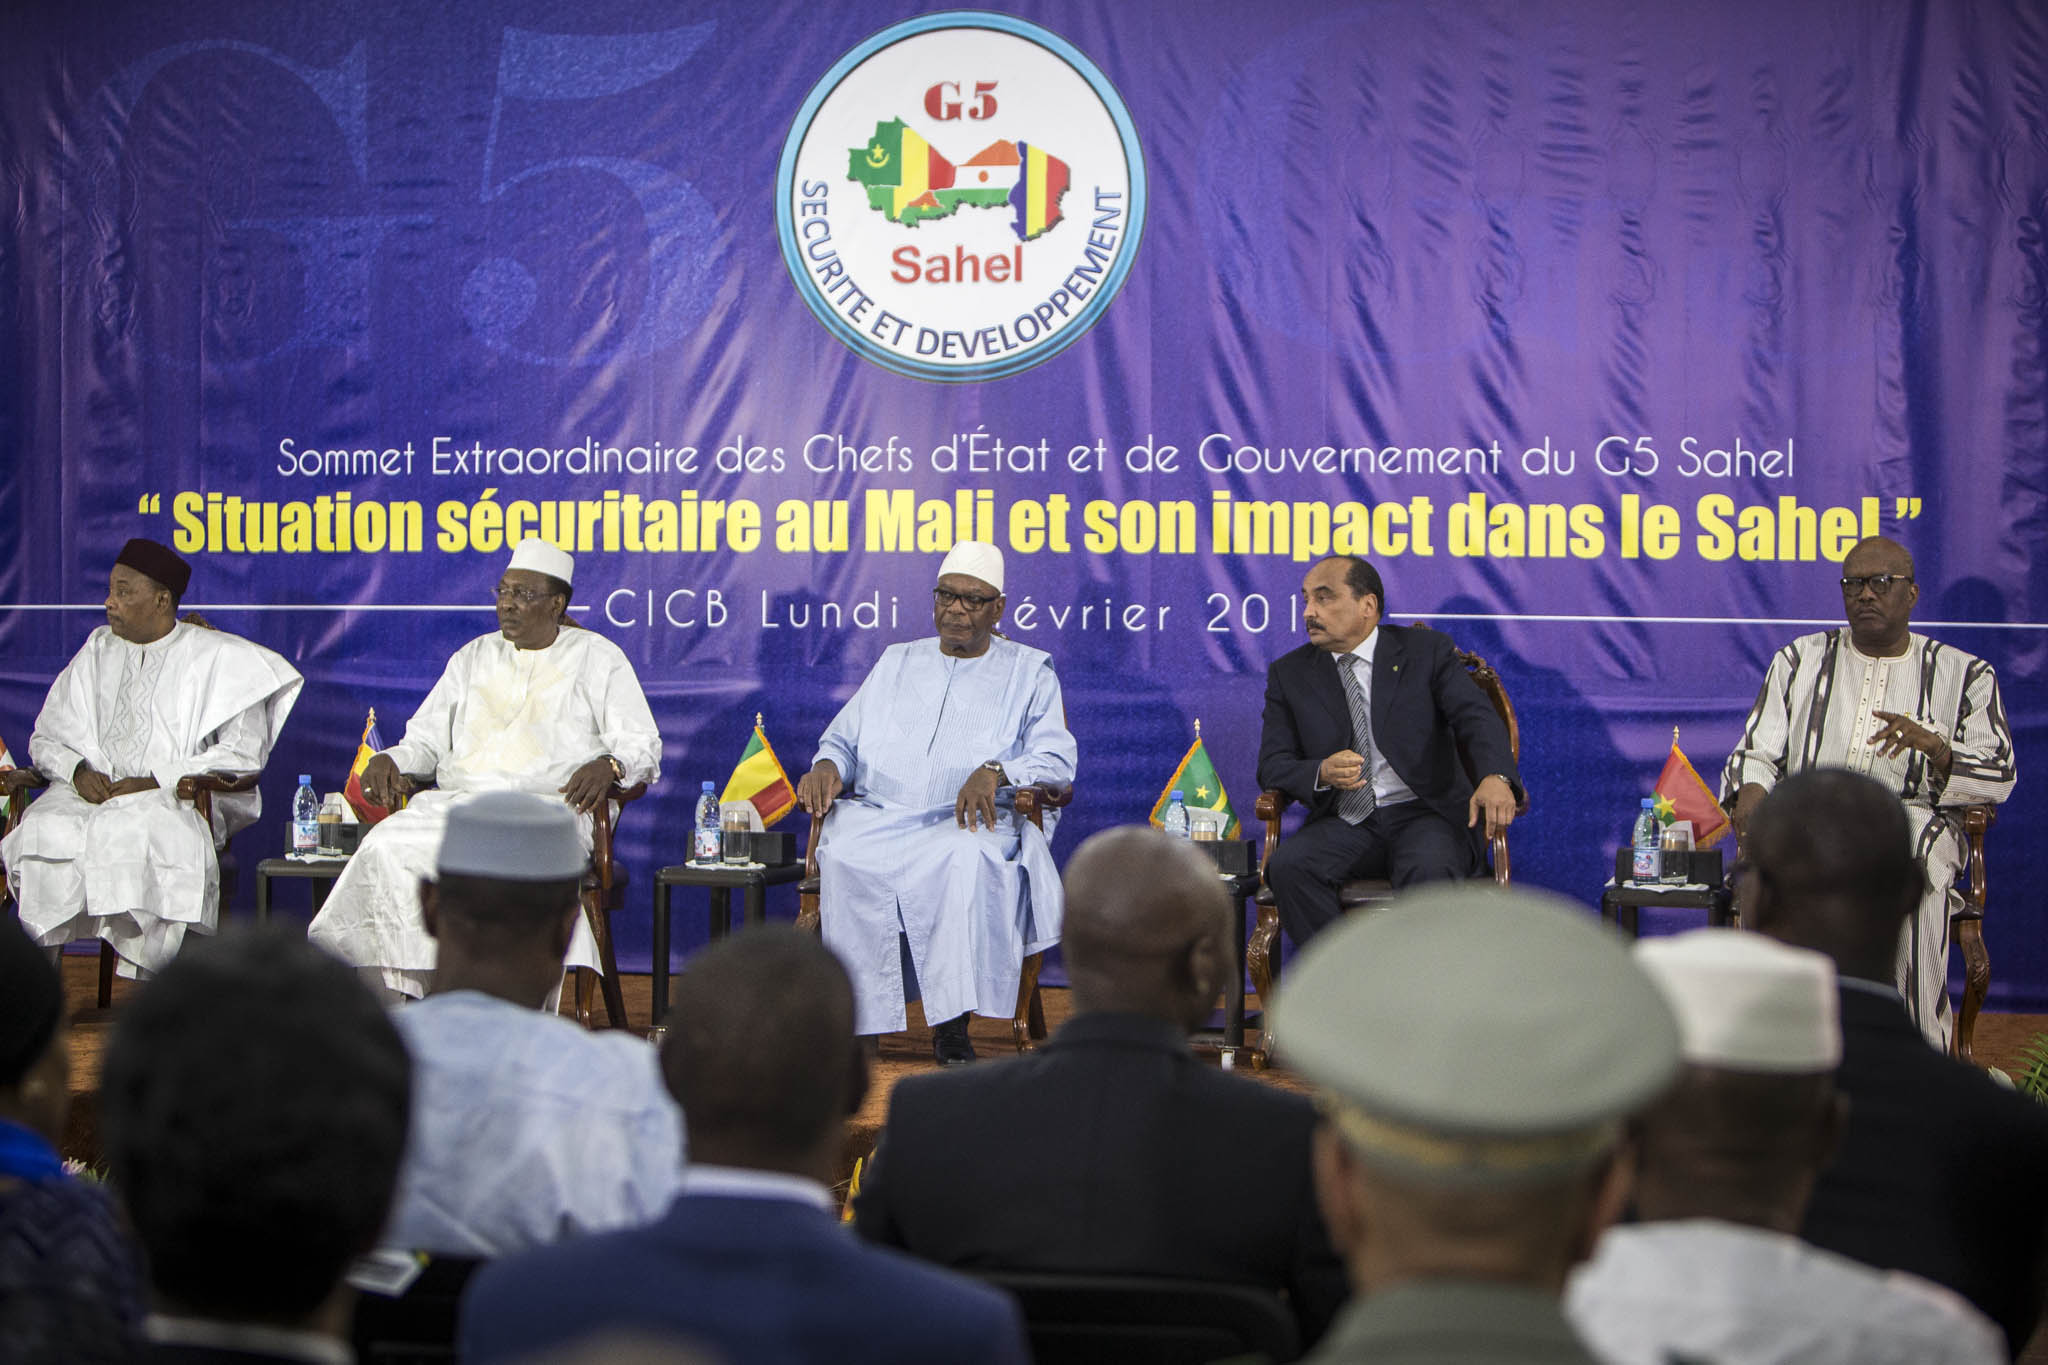 17 02 06 G5 Sahel President 01